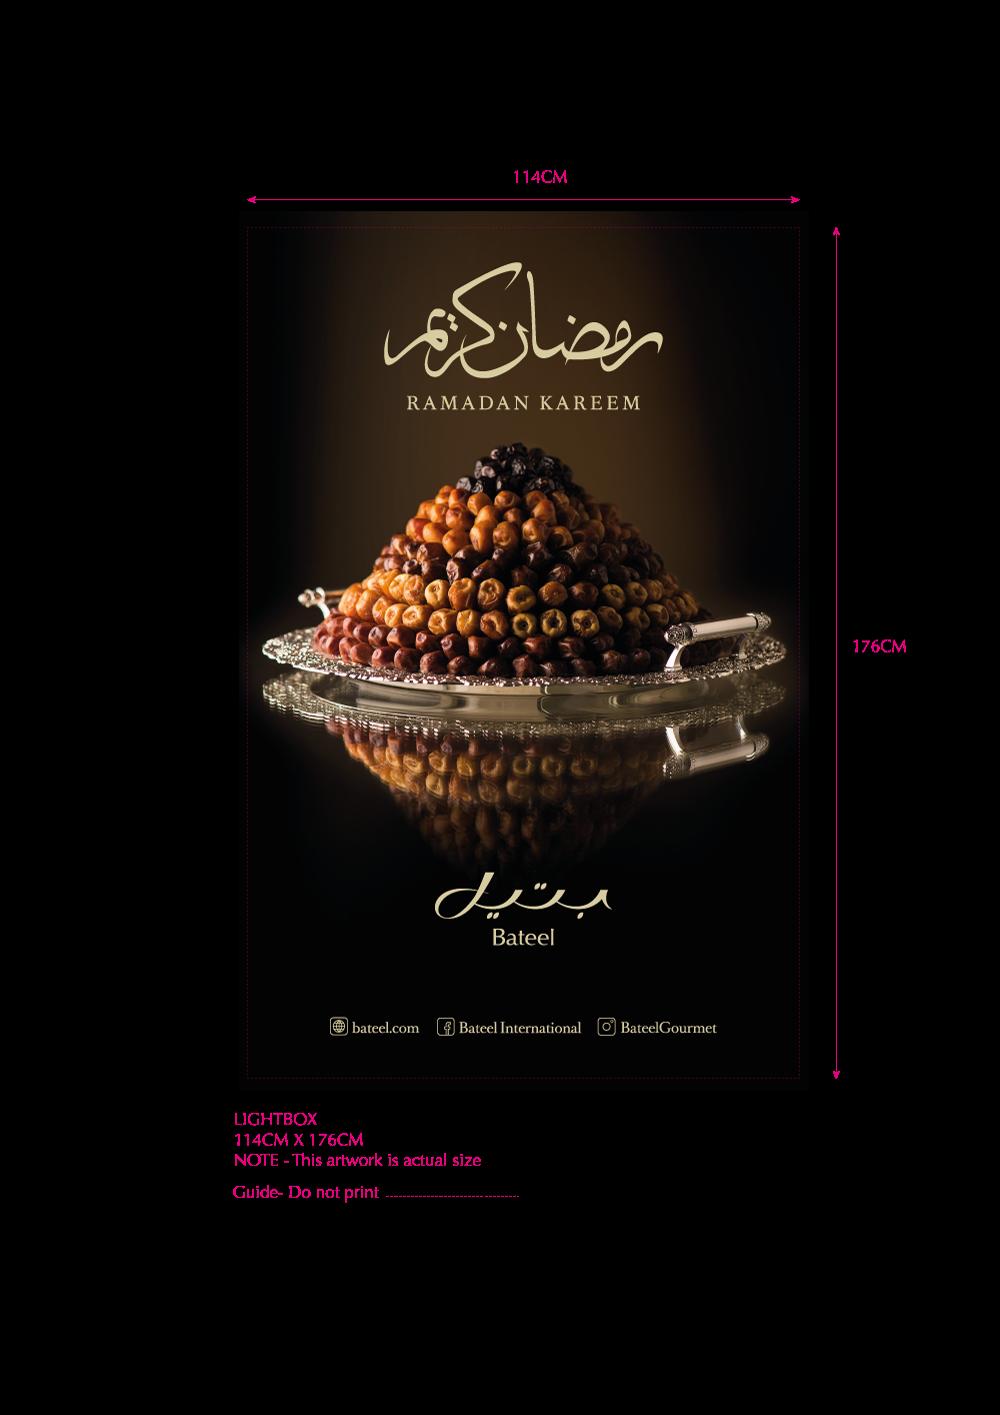 BAHRAIN-Lightbox_2017